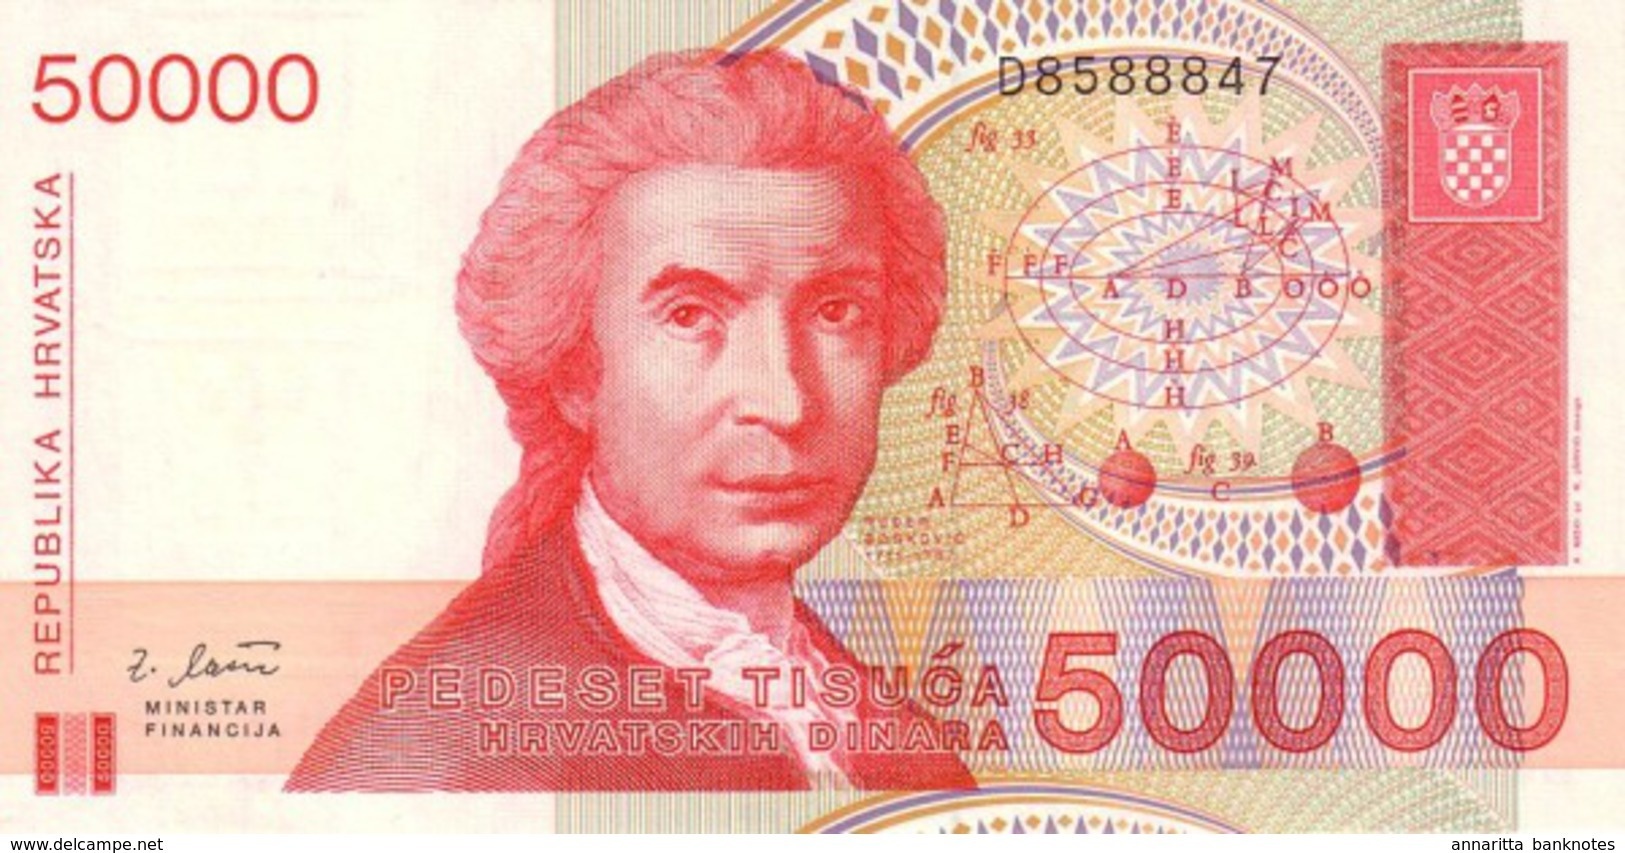 CROATIA 50000 DINARS 1993 P-26 UNC [ HR311a ] - Croatia